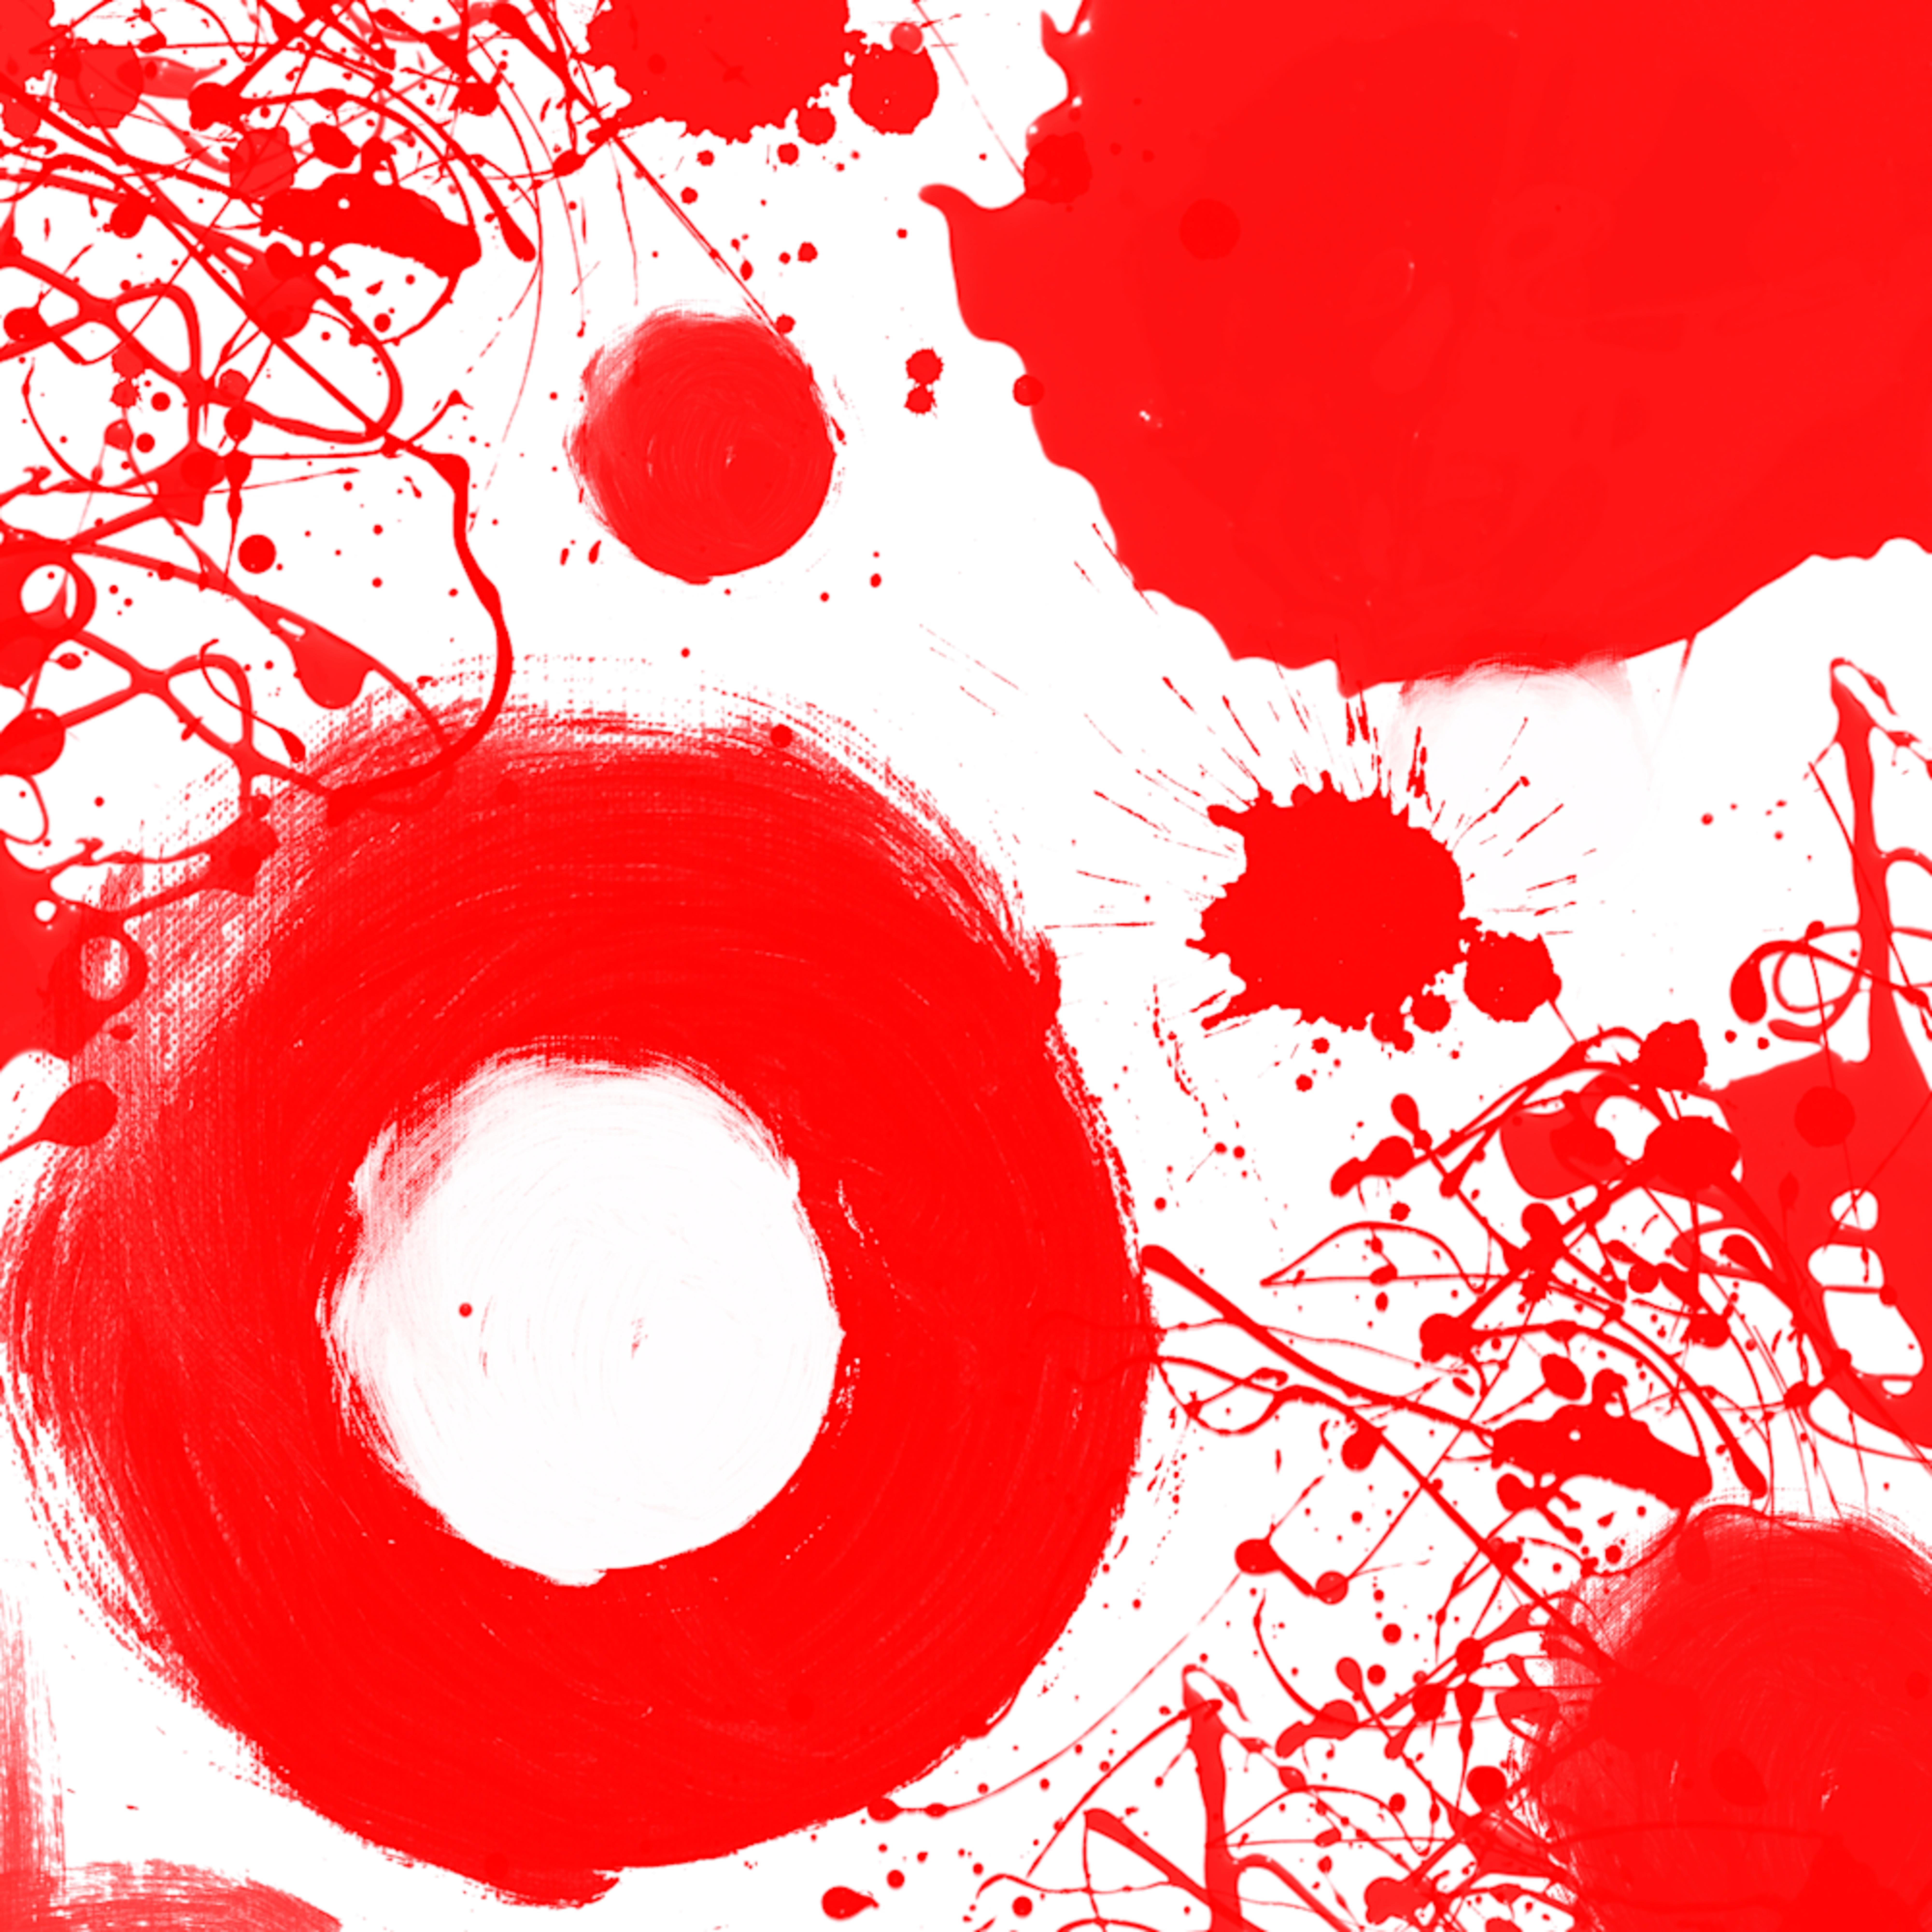 Abstract art 80 61 af9rcz